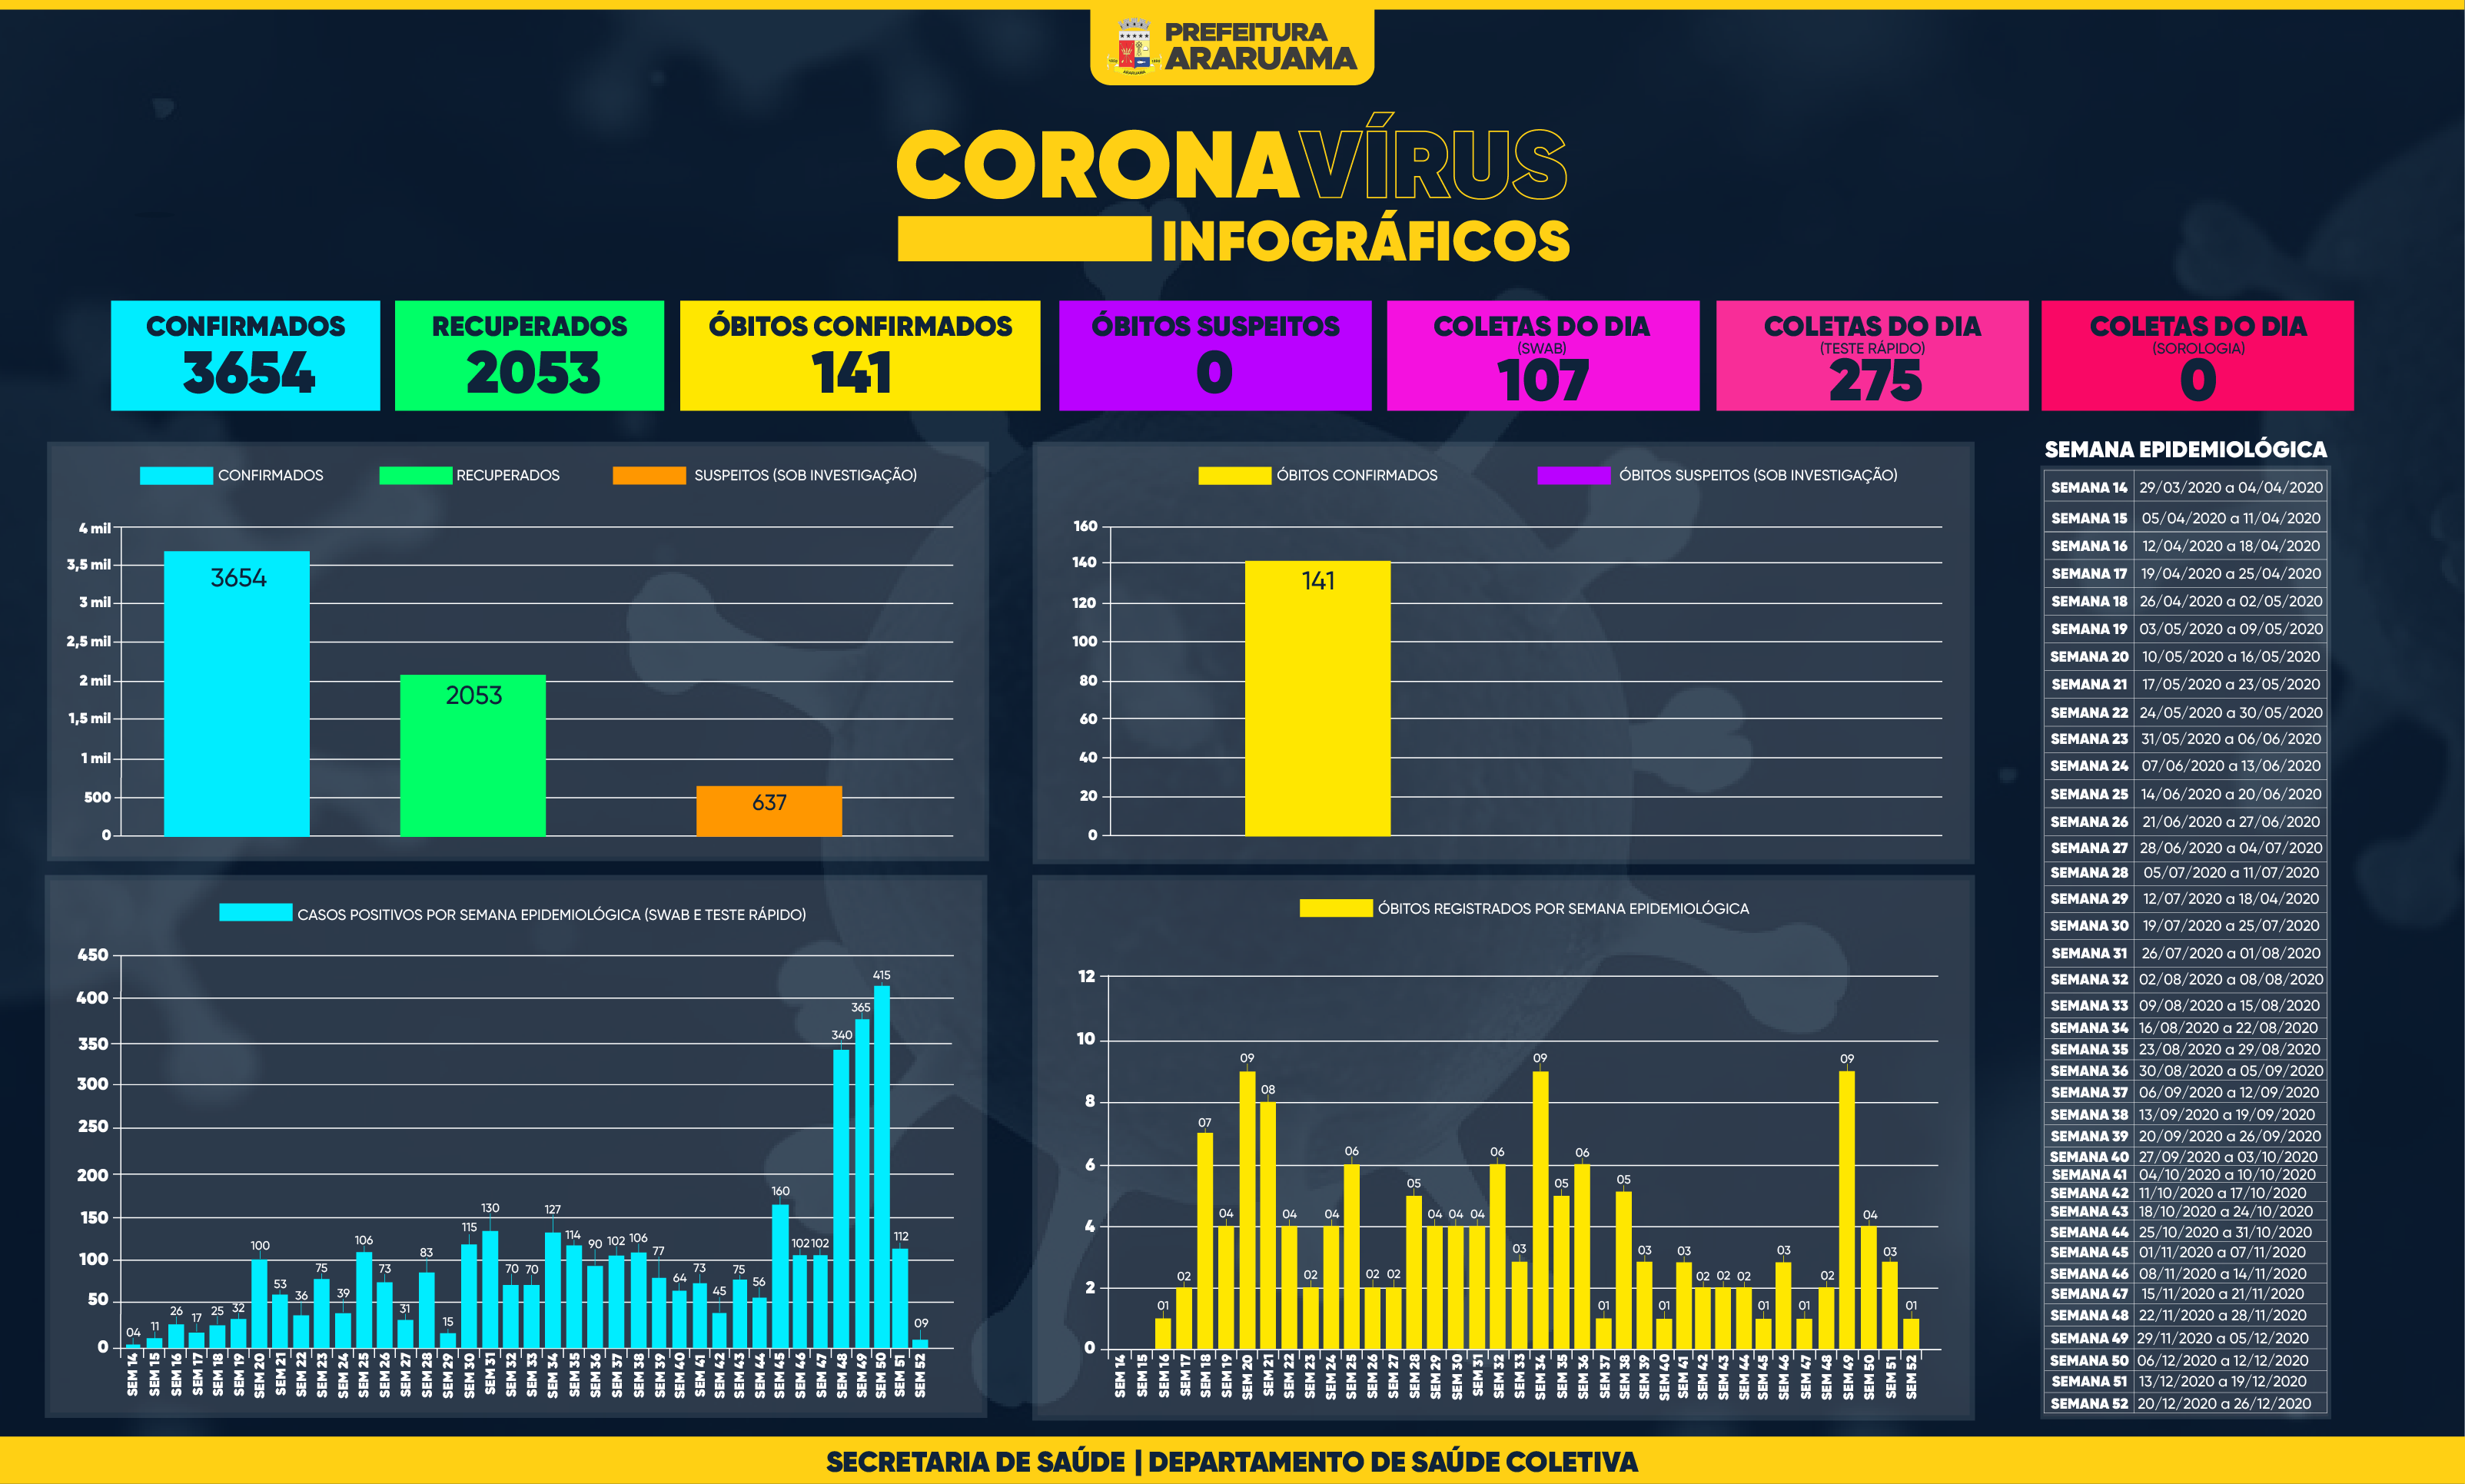 Painel de Monitoramento COVID-19 — Semana 52 — 22 de dezembro de 2020